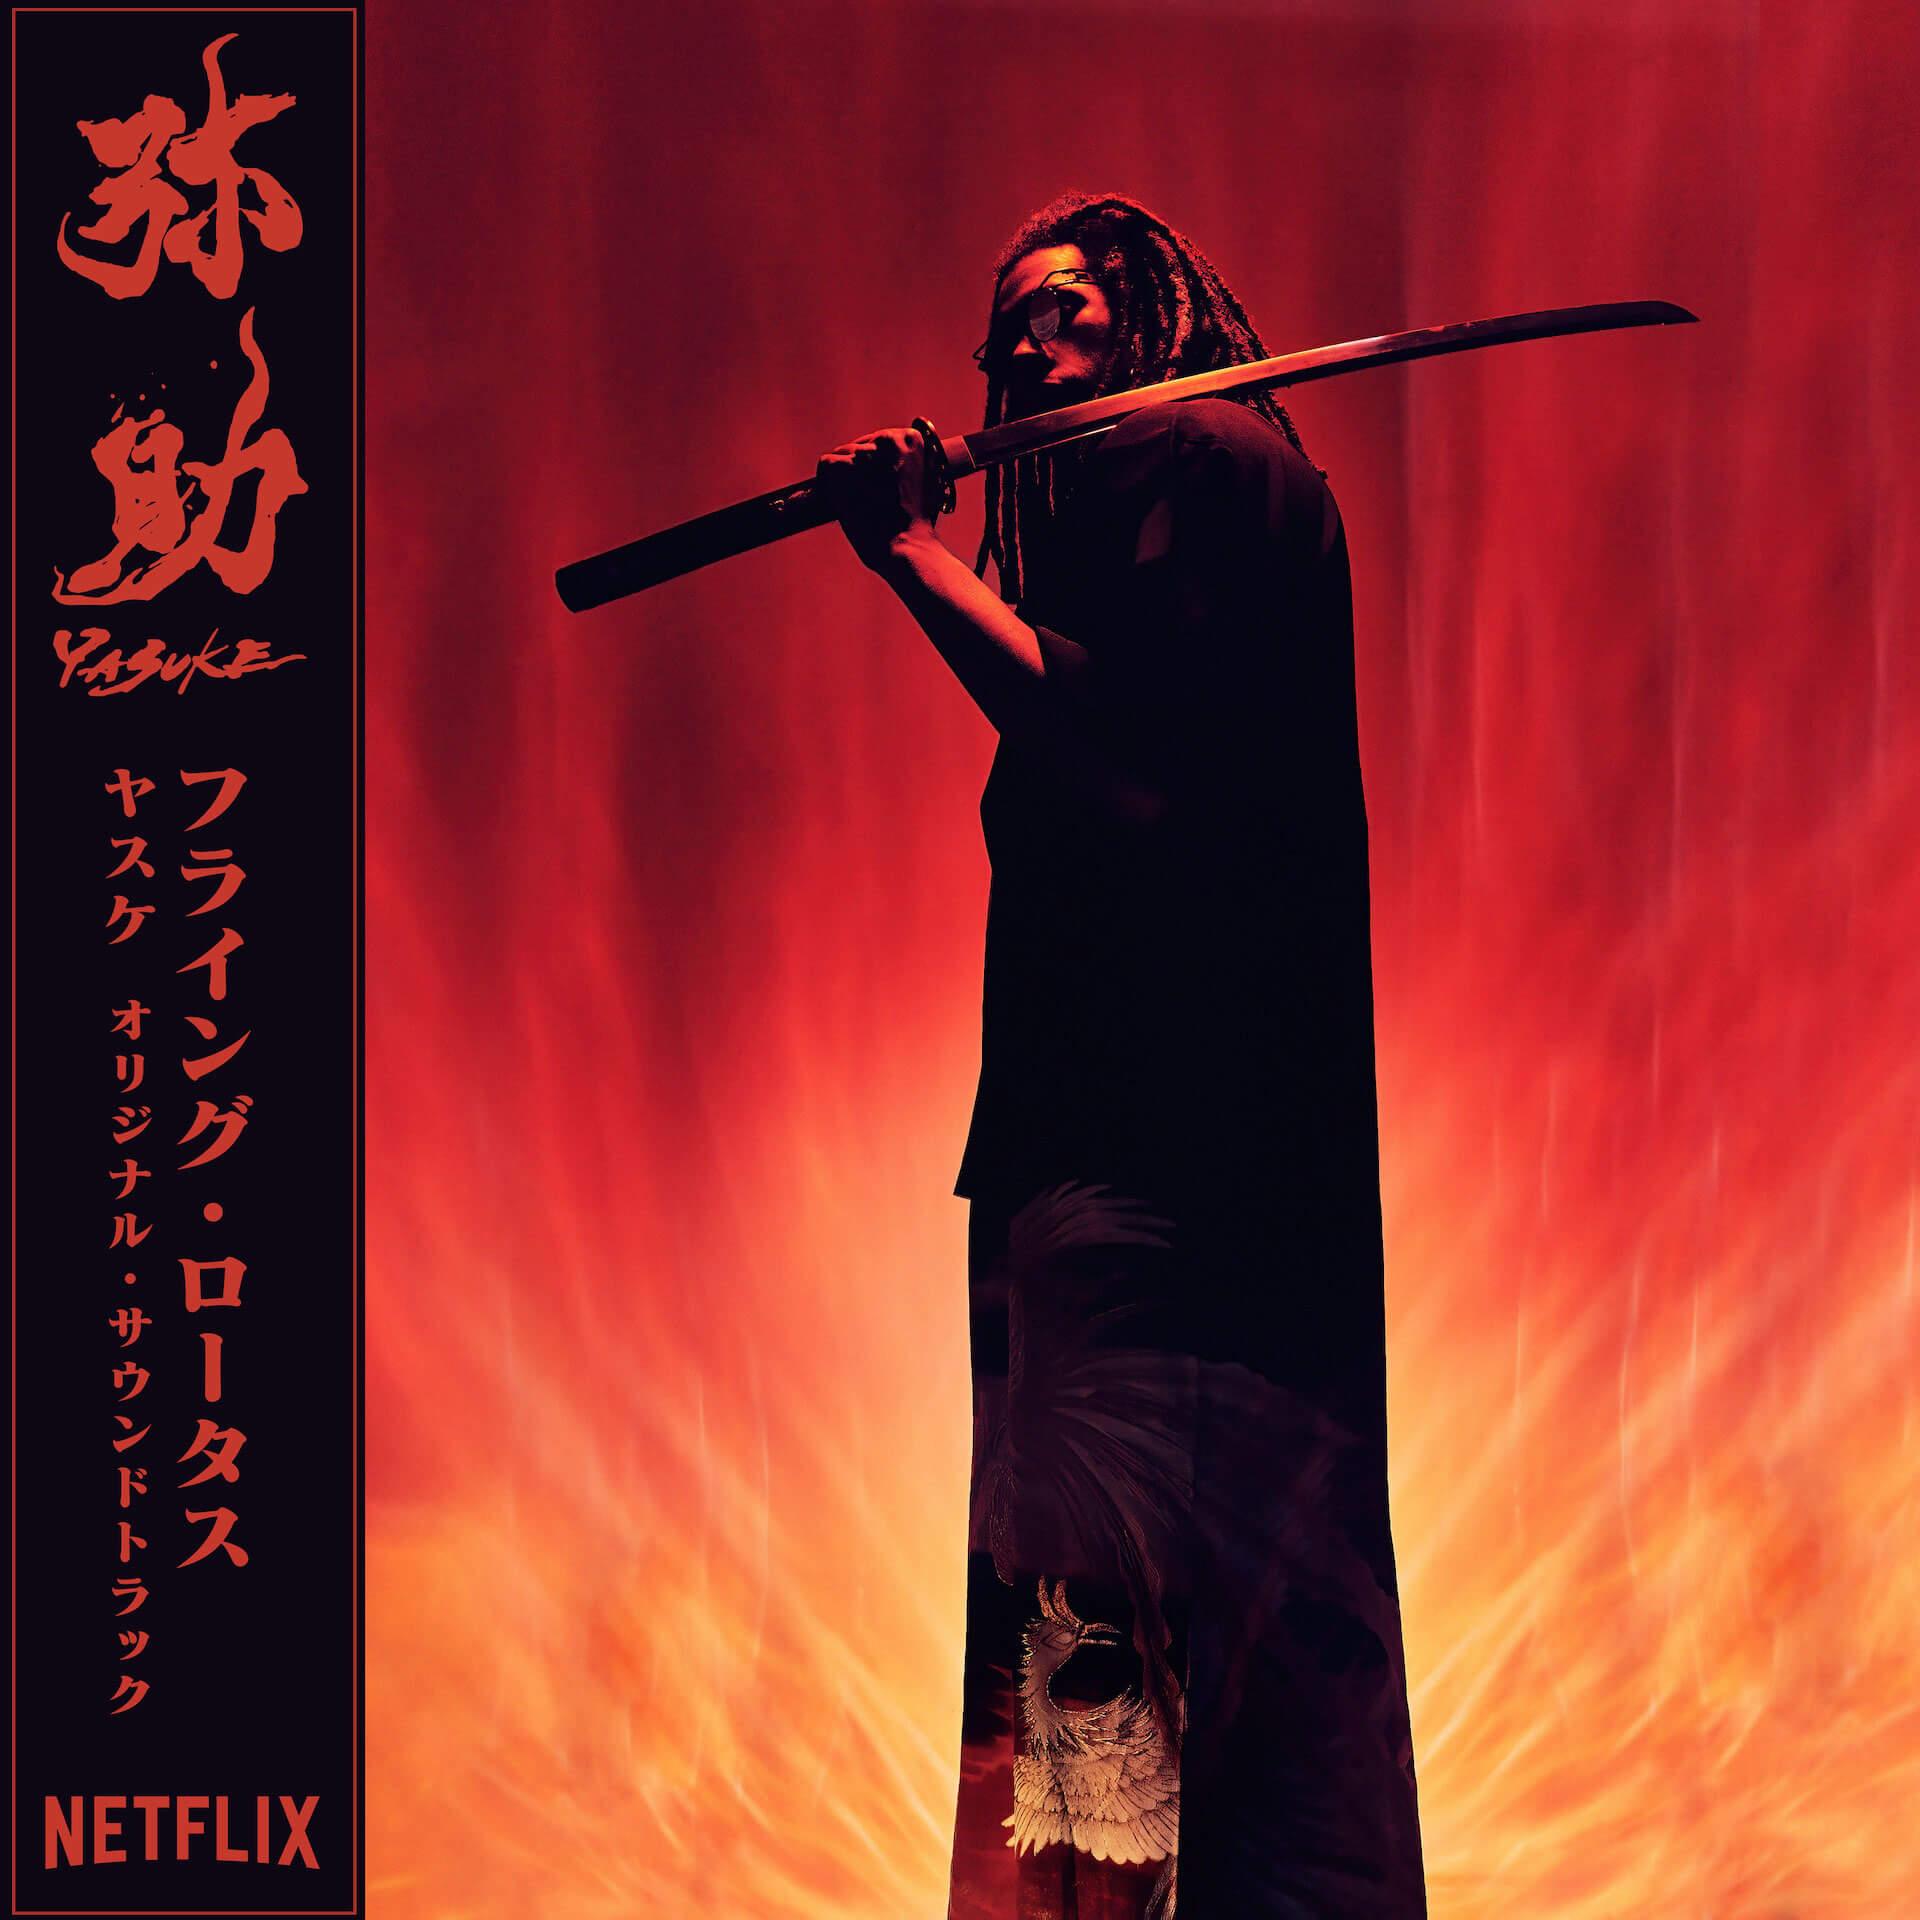 『YASUKE -ヤスケ-』の音楽を手がけたFlying Lotus最新作『YASUKE』が明日CDリリース!超高音質試聴イベントも実施 music210617_flyinglotus_yasuke_8